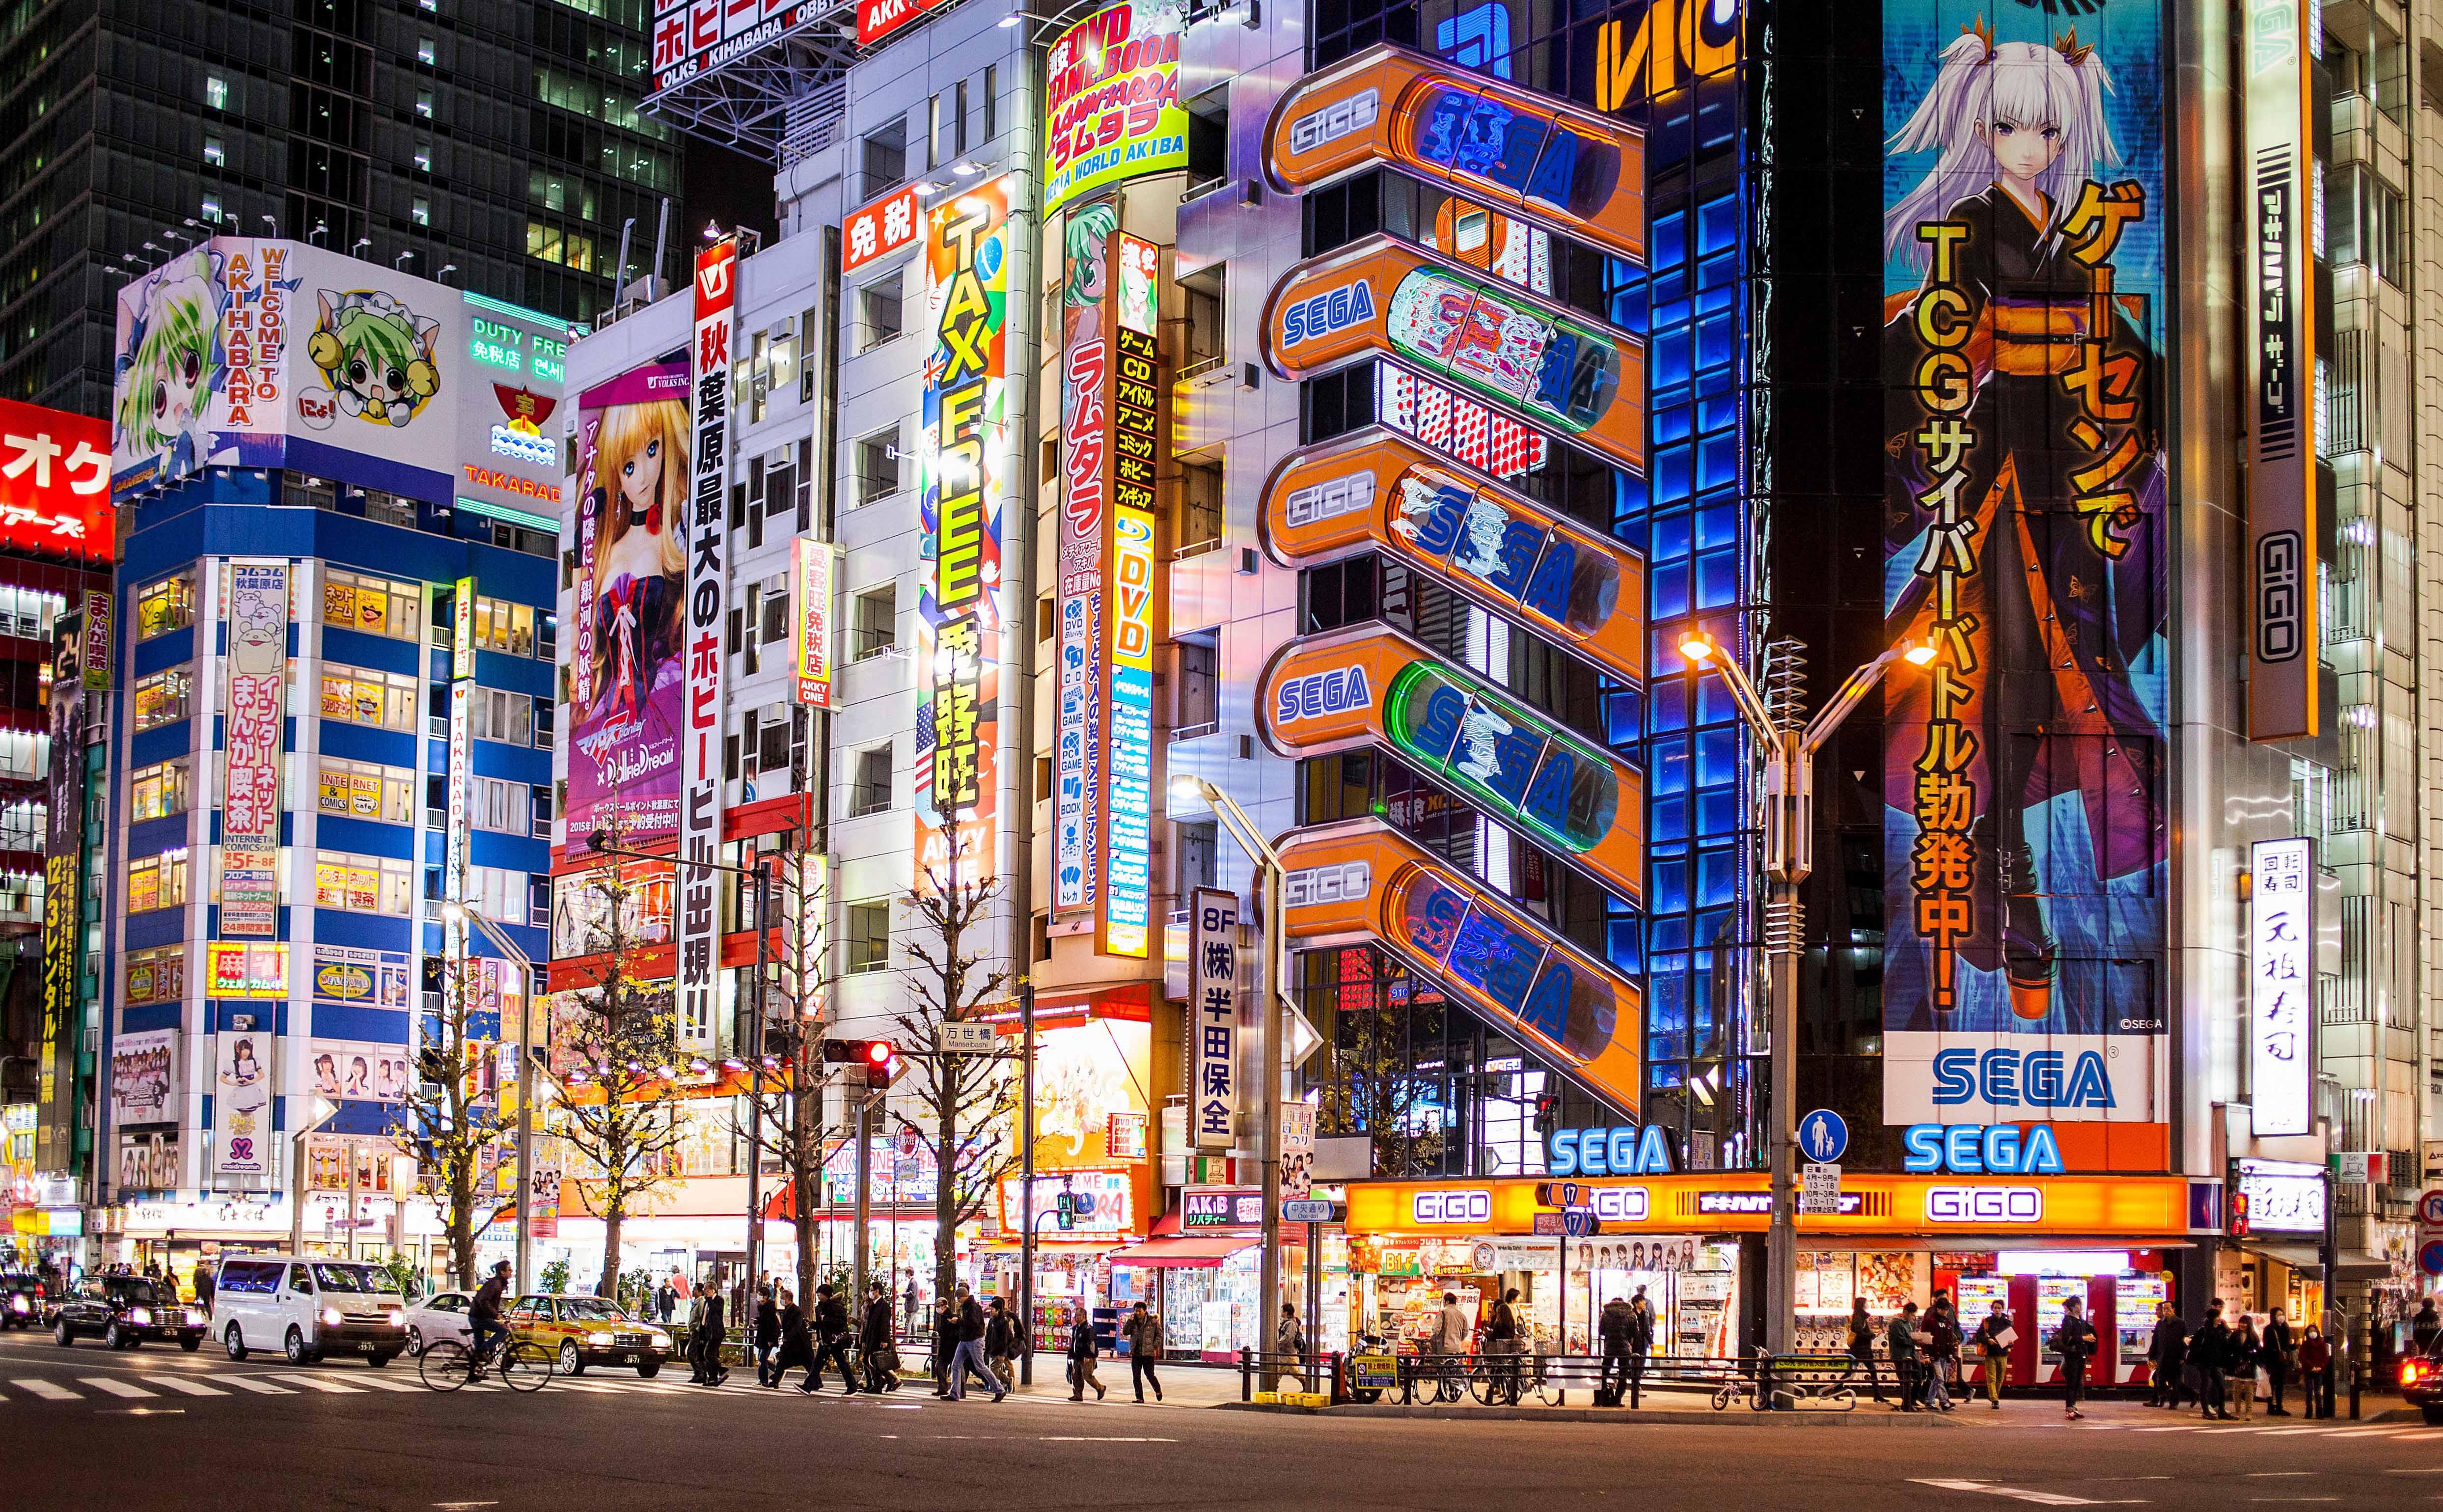 Most Instagrammable Spots In Tokyo